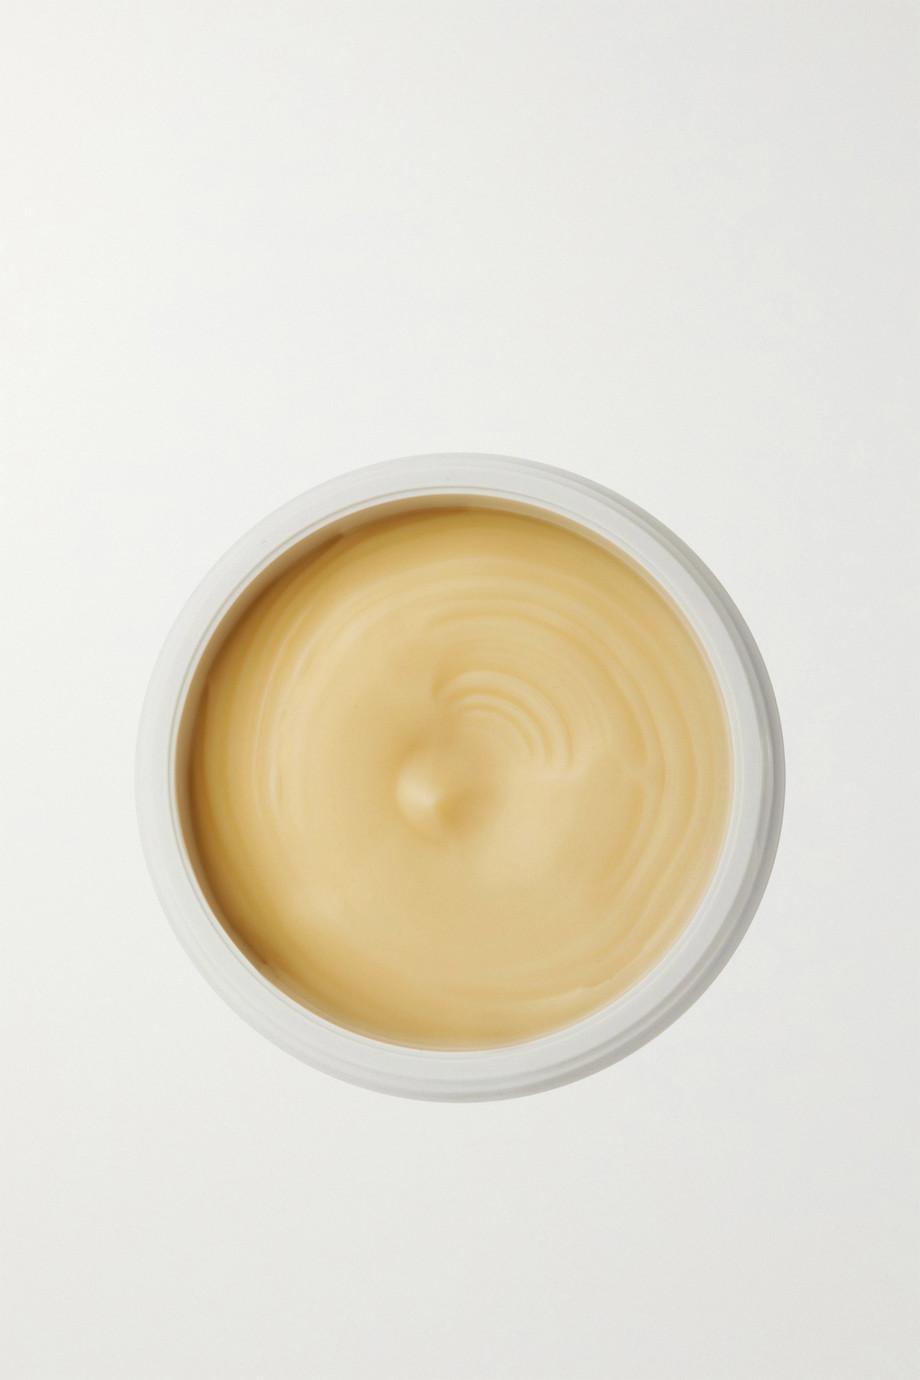 Bamford Cleansing Balm, 100 ml – Reinigungsbalsam